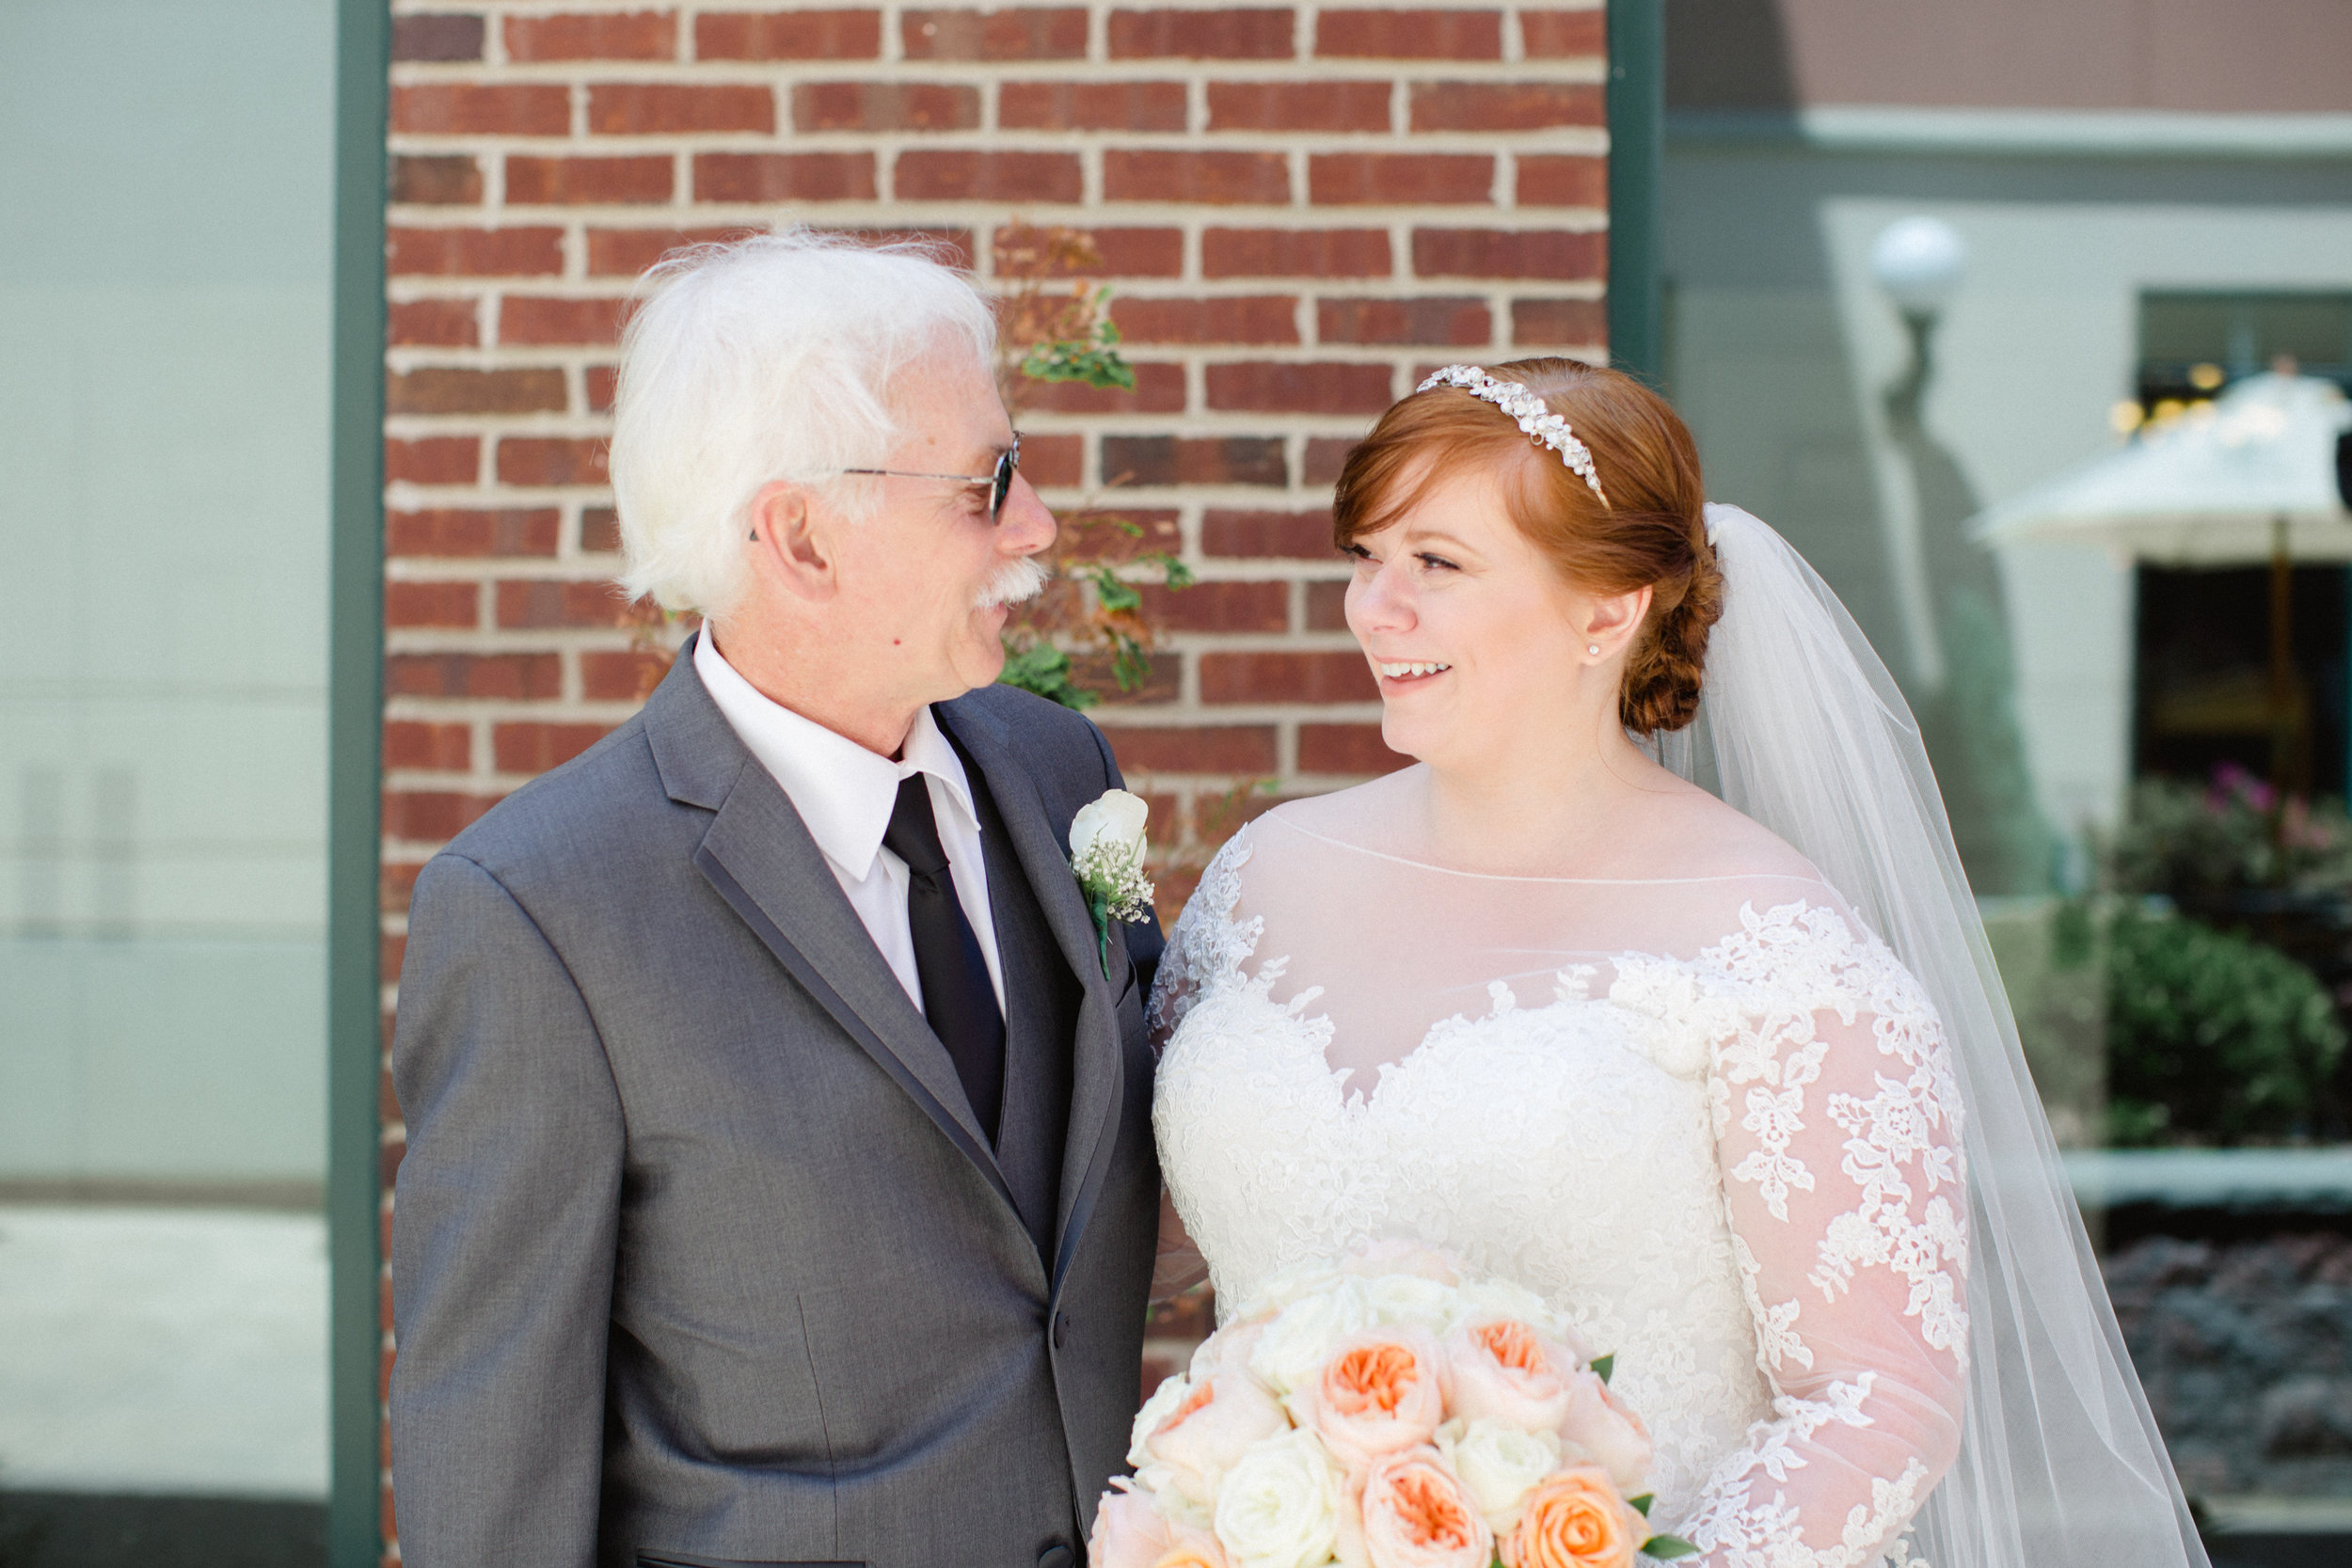 Fiorellis Wedding Photos_JDP-36.jpg